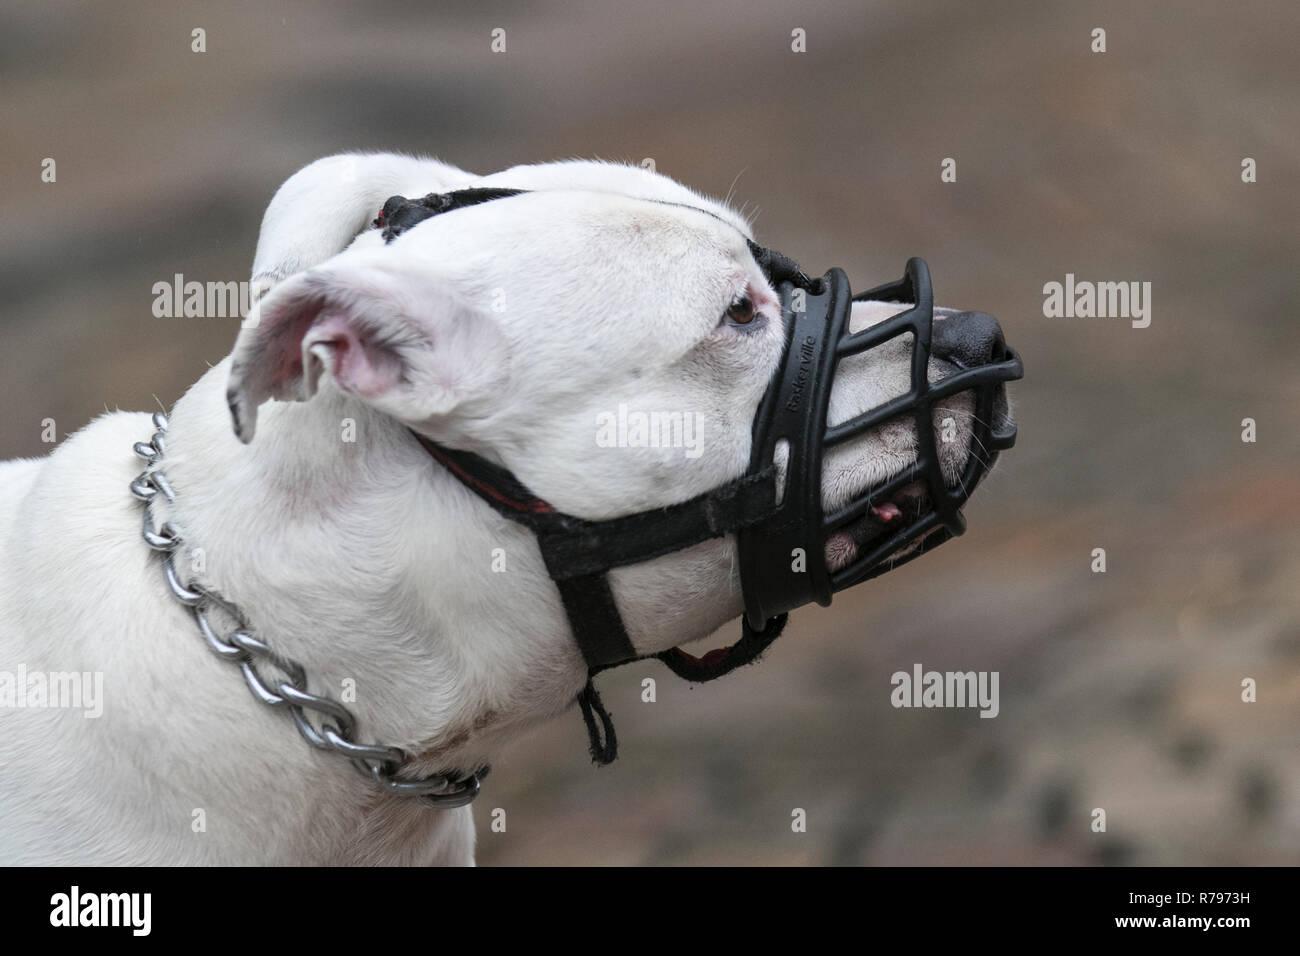 White Staffordshire Bull Terrier dog  wearing black muzzle. - Stock Image